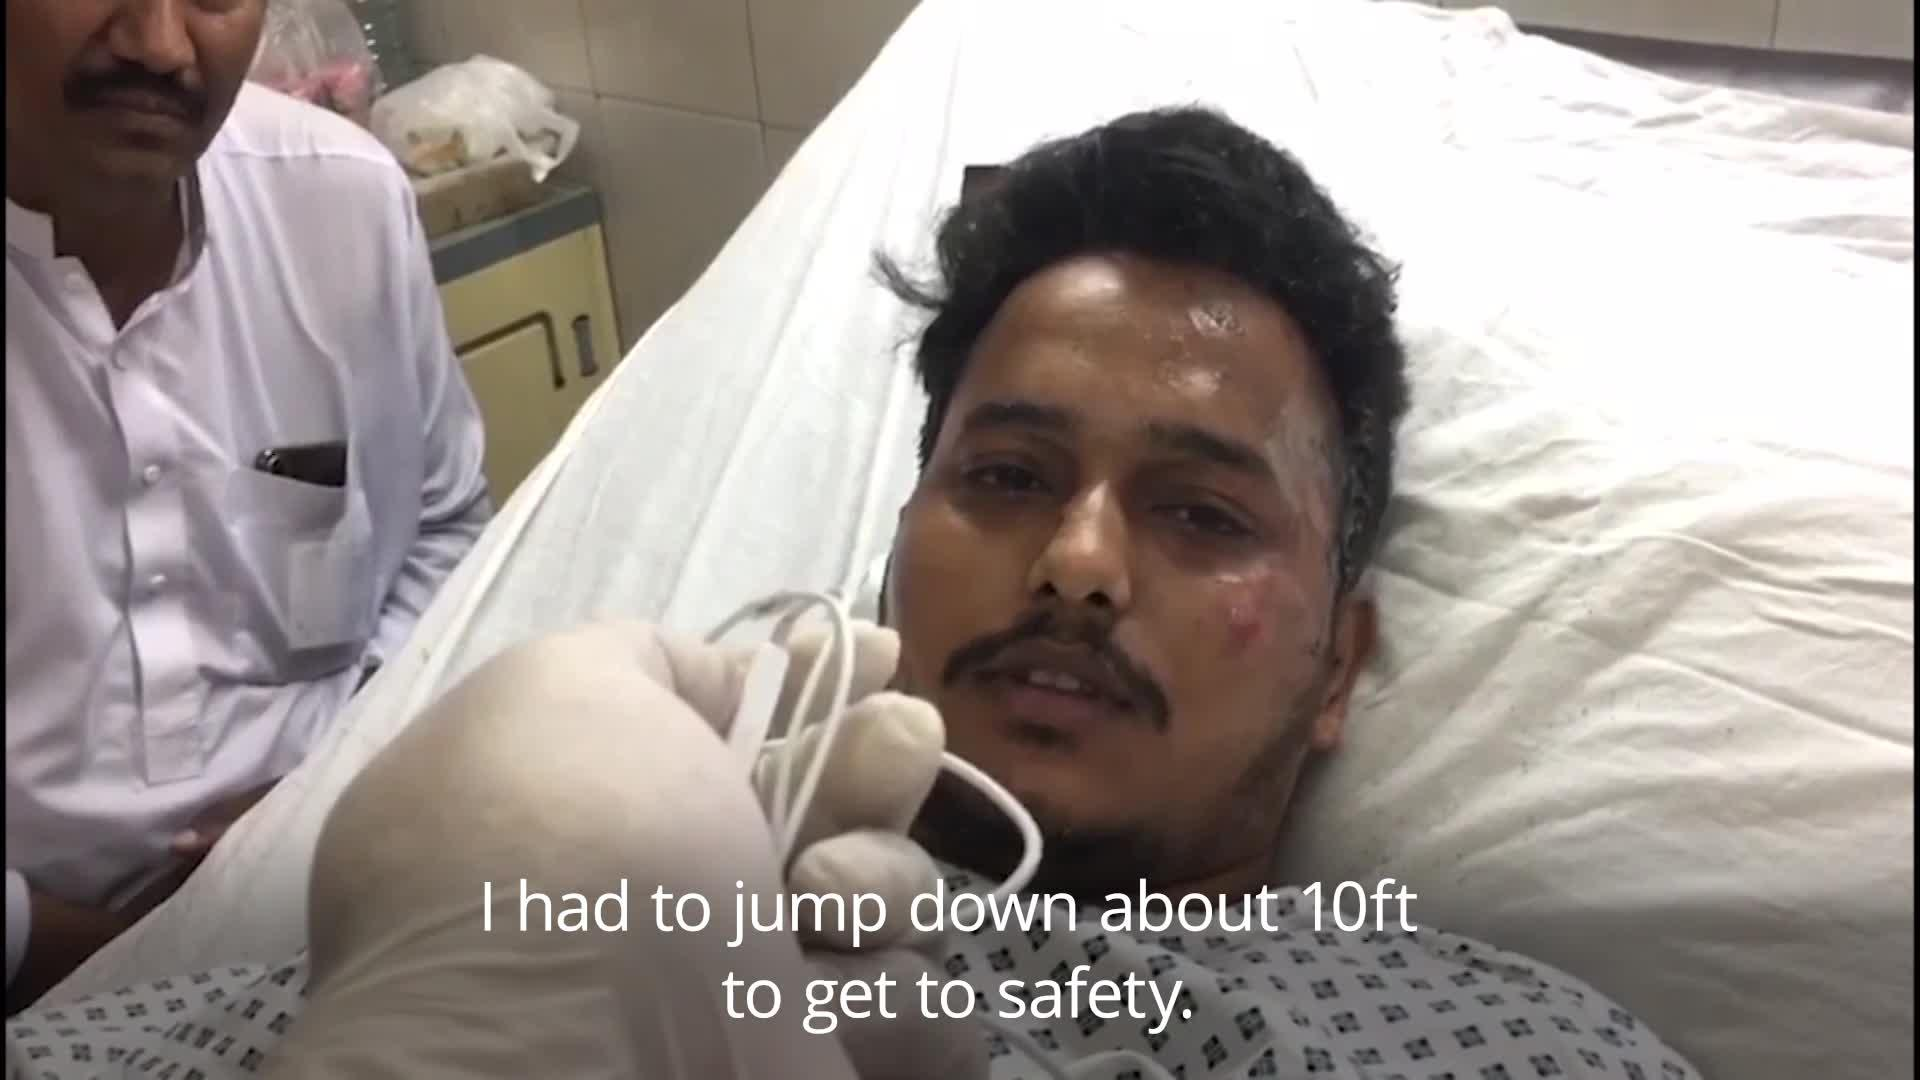 Pakistan plane crash survivor tells of 'jump' to safety